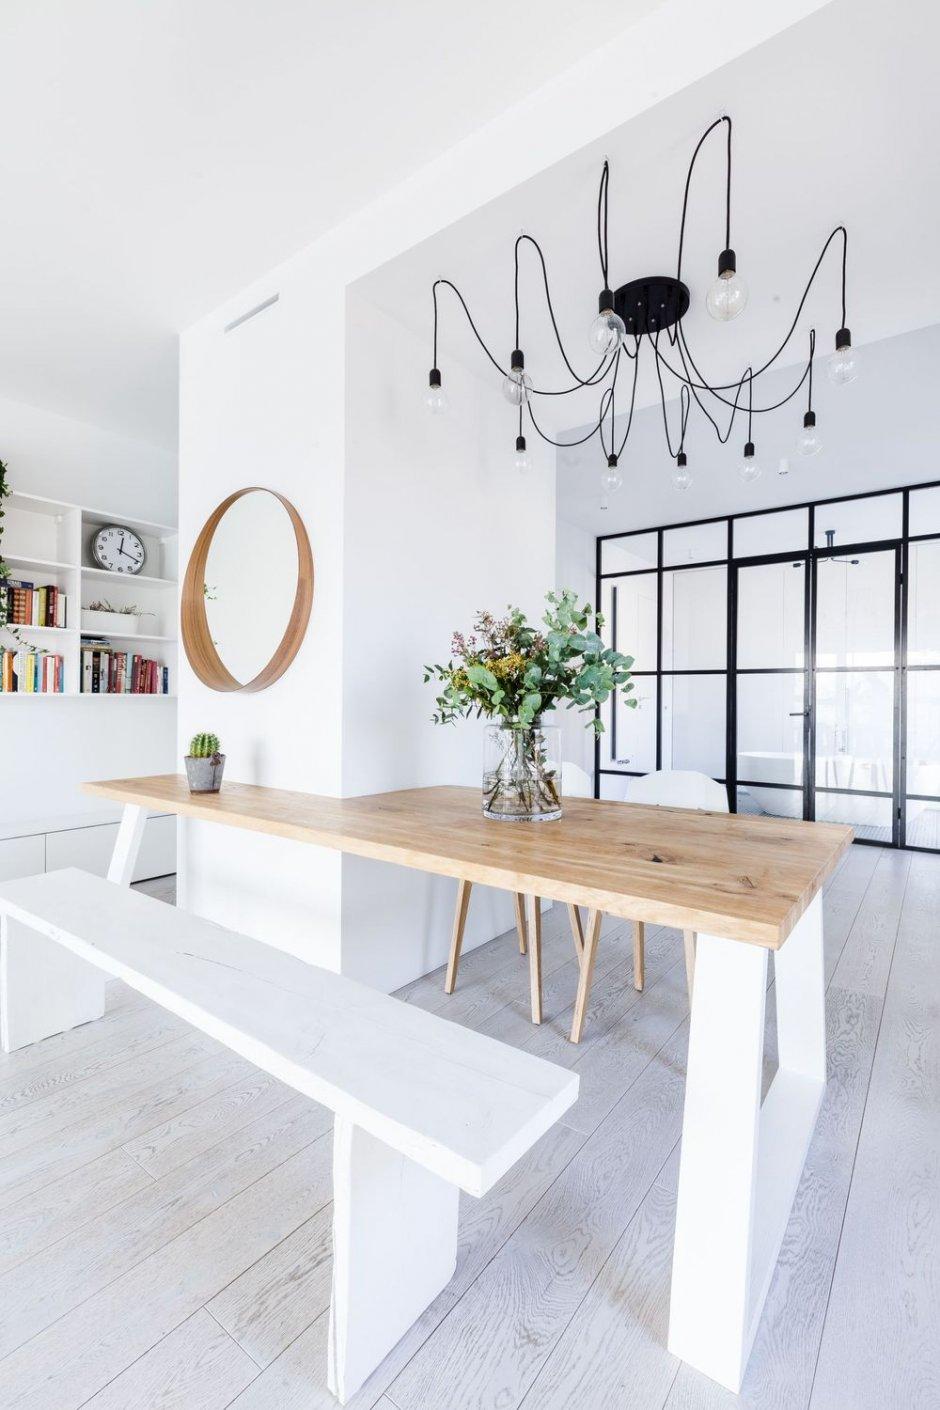 apartament hustawka pion studio5